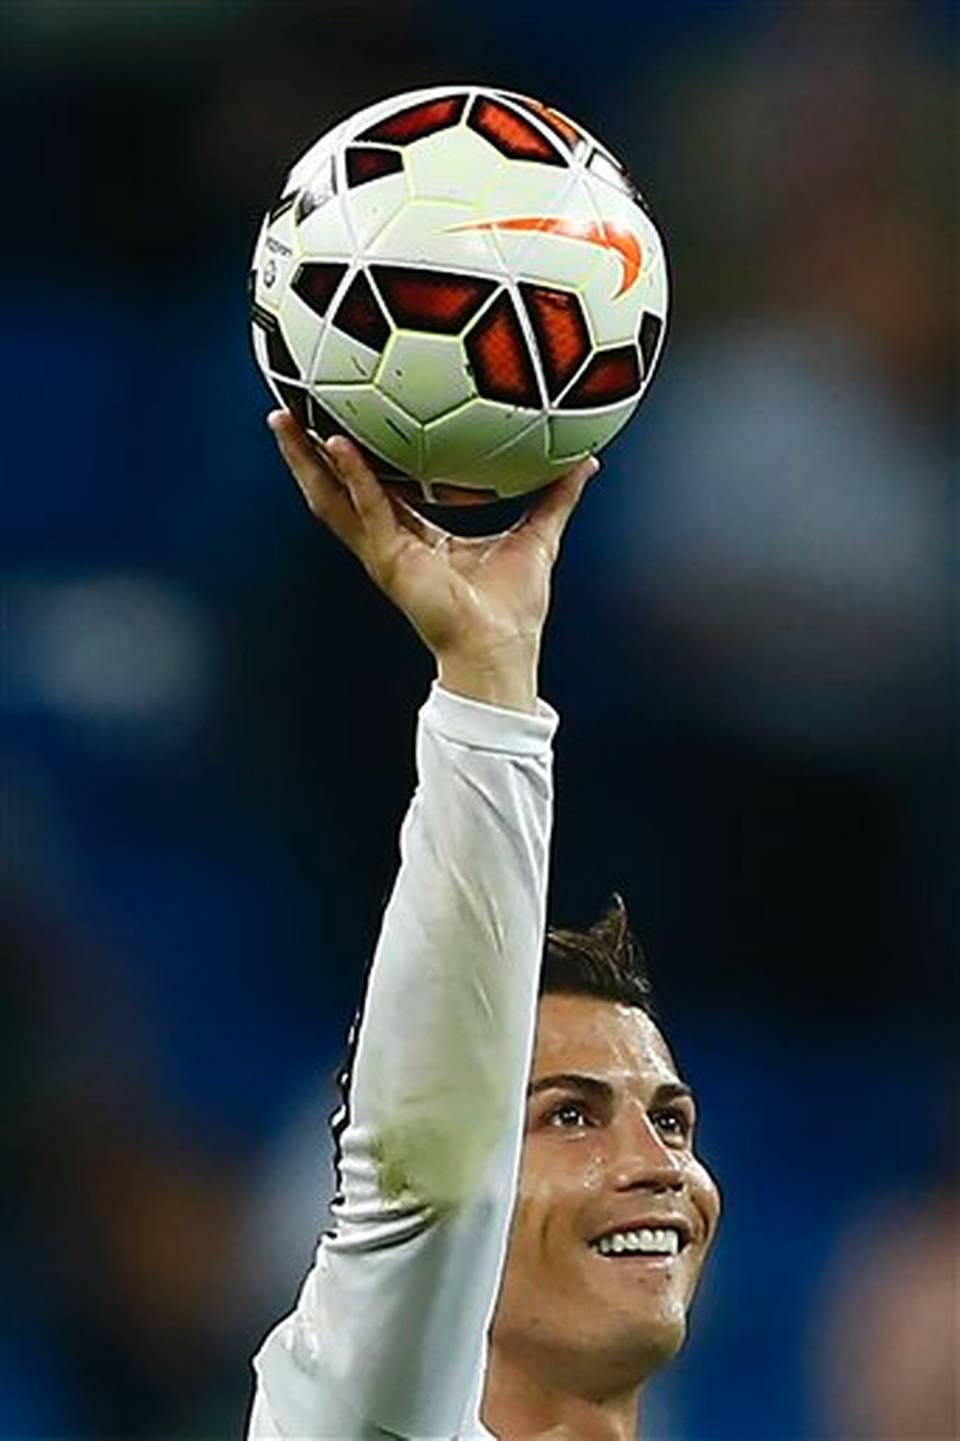 cr7-es-una-bestia-marcar-goles-bicho-record-cristiano